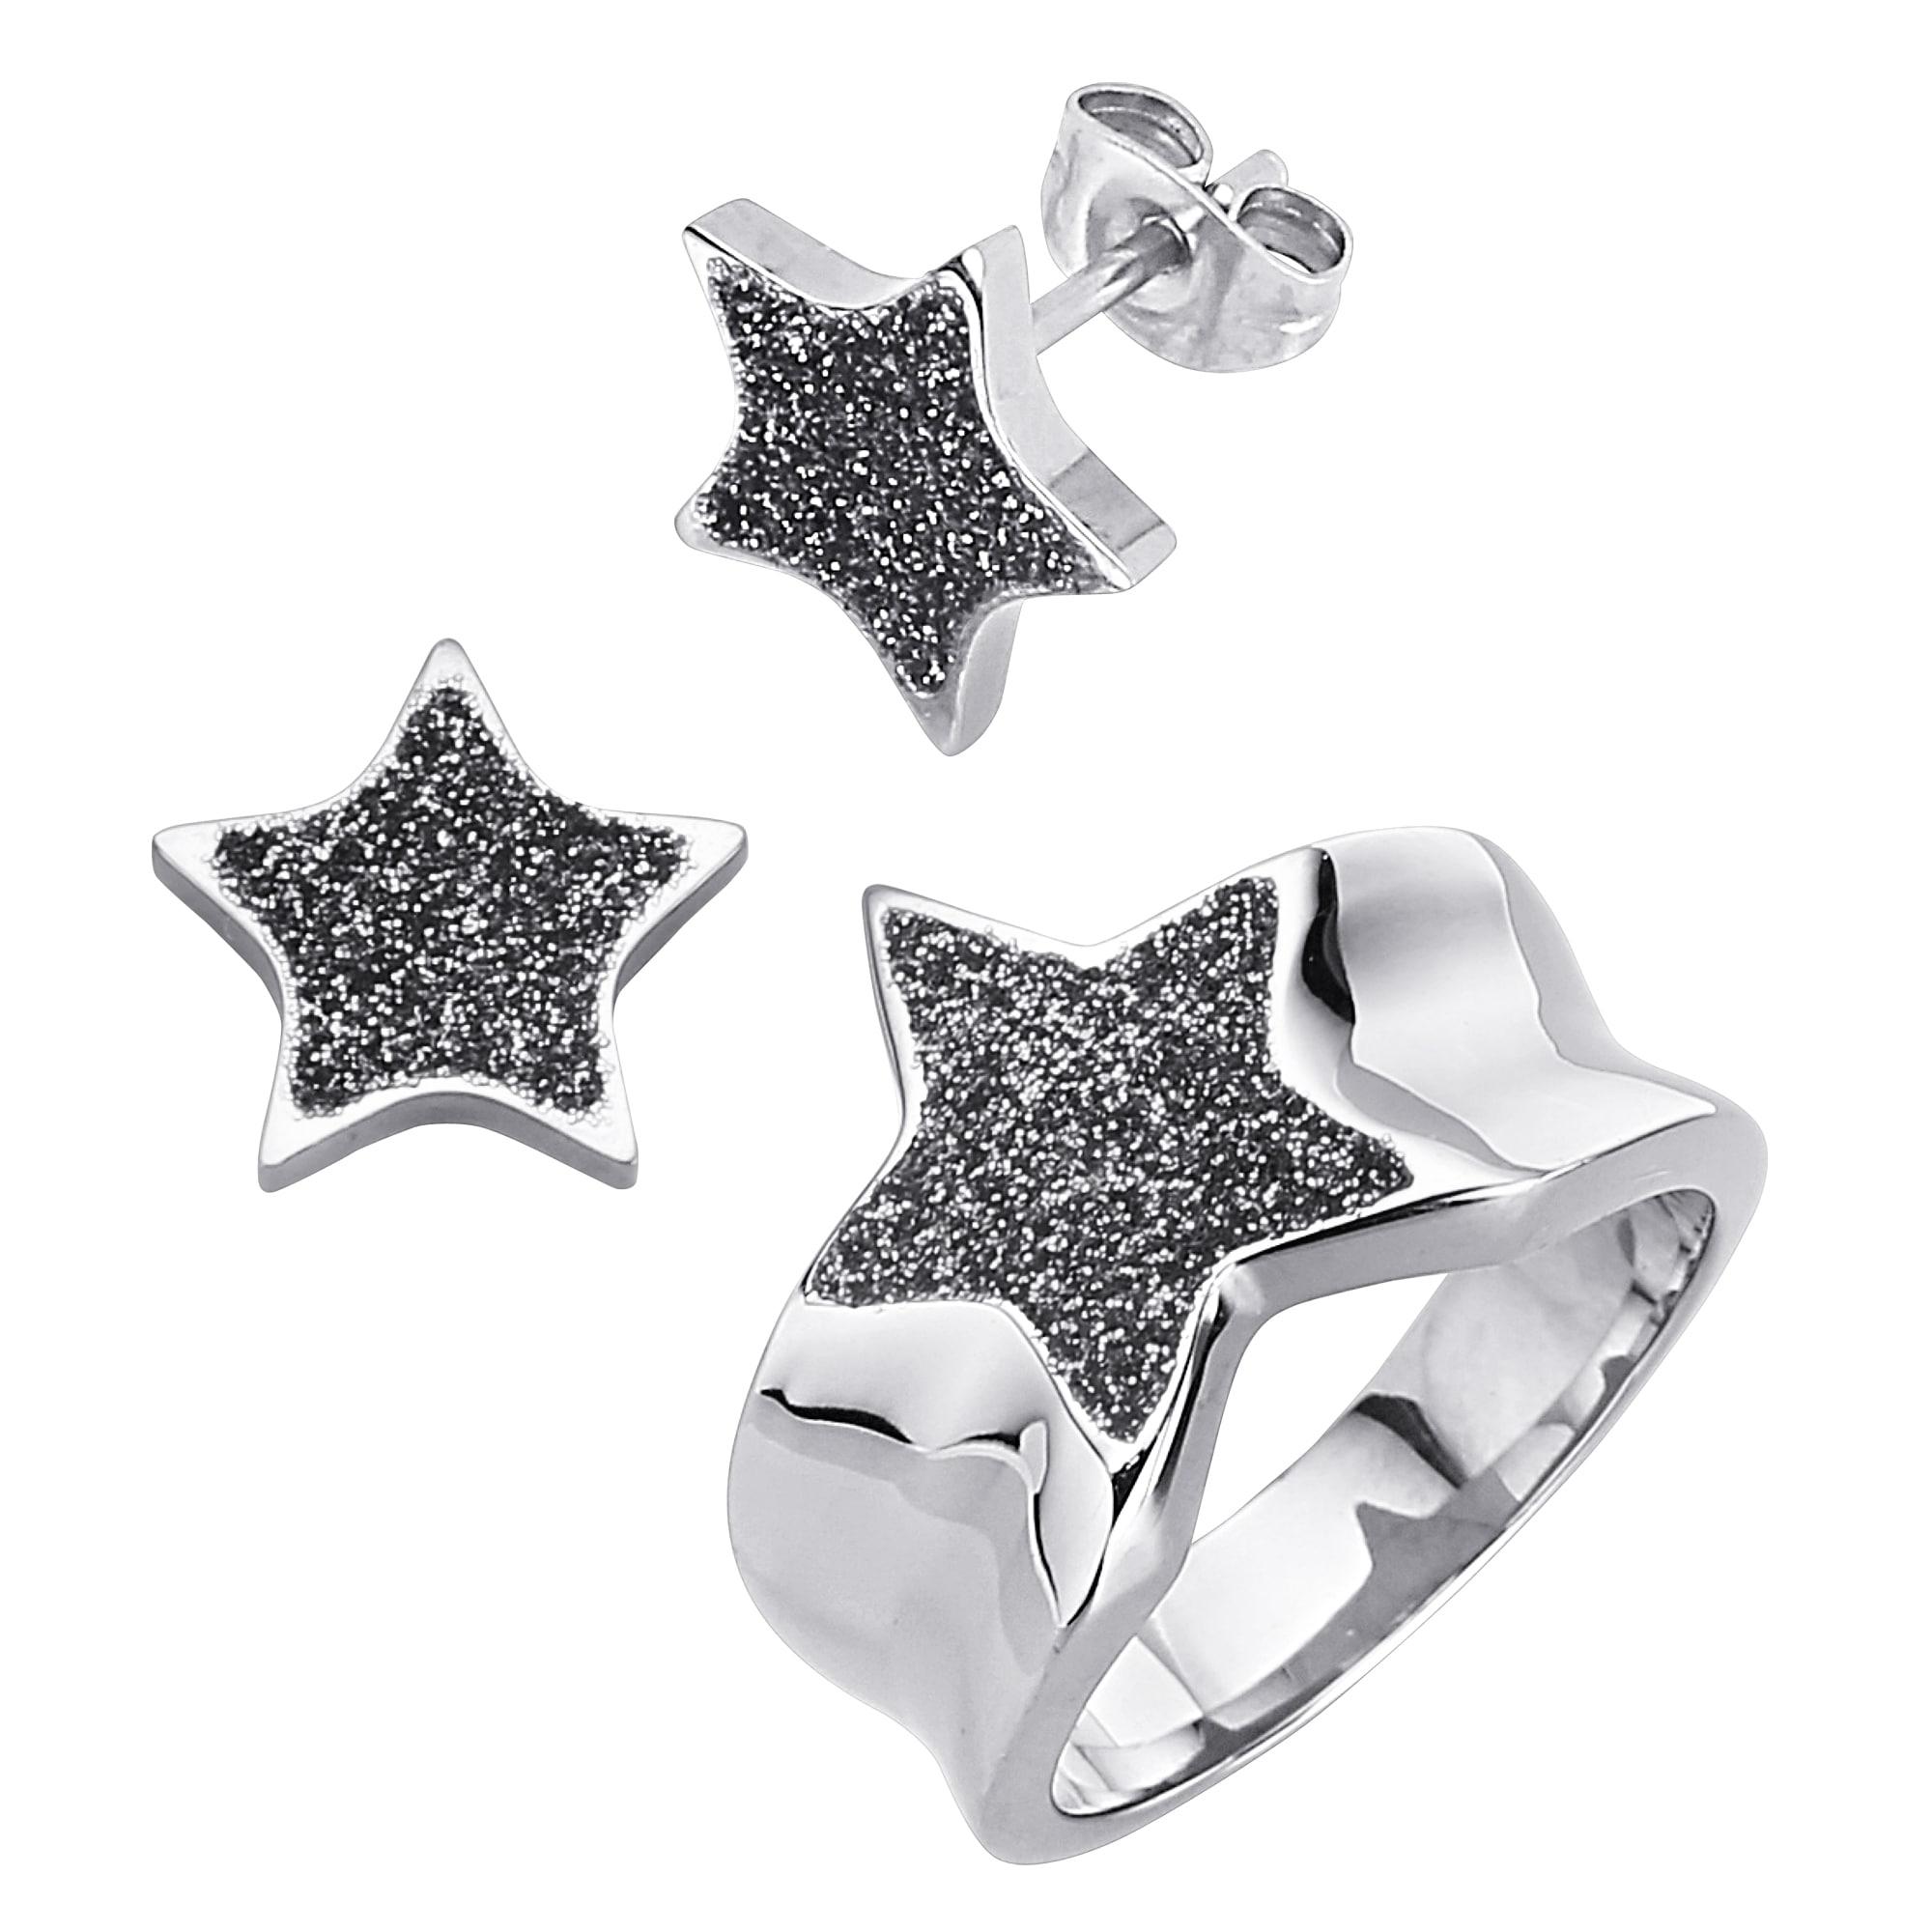 Jacques Lemans Set Ring Ohrstecker schwarz Damen Modeschmuck (nur Ohrringe) Ohrringe Schmuck